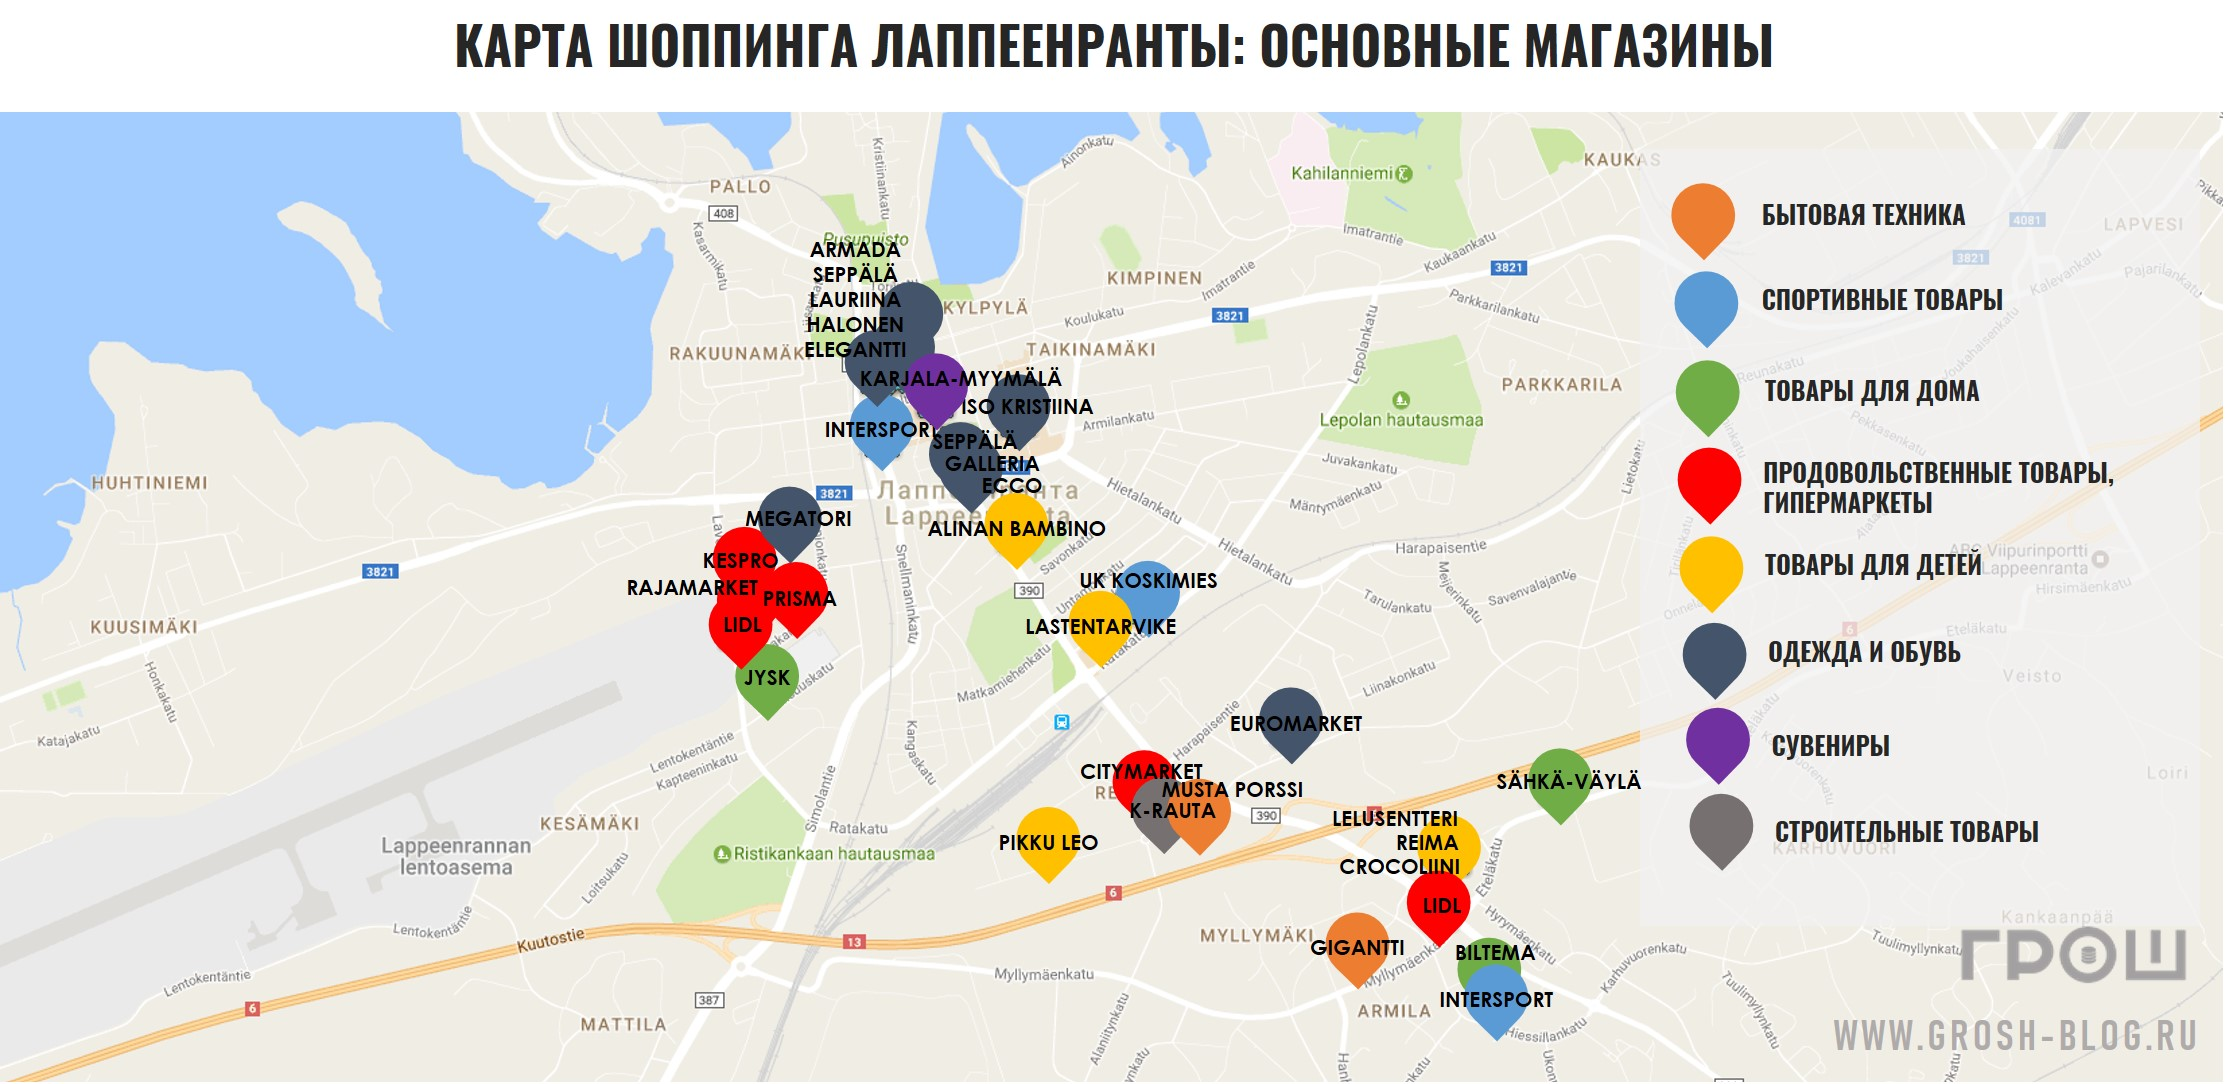 лаппеенранта карта магазинов https://grosh-blog.ru